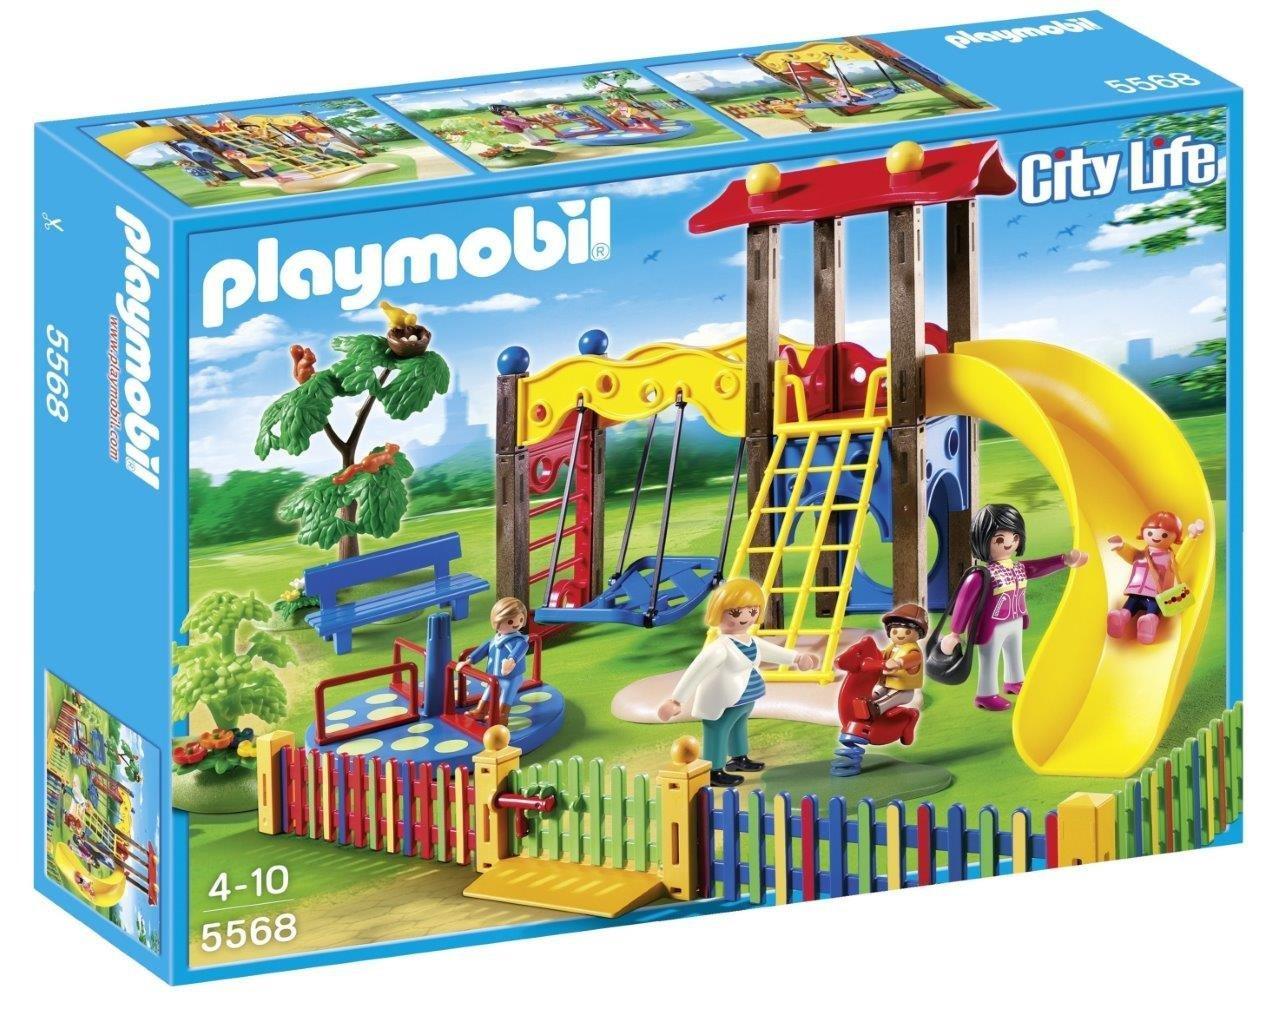 Playmobil Guardería - Zona de juegos infantil, playset (5568) product image